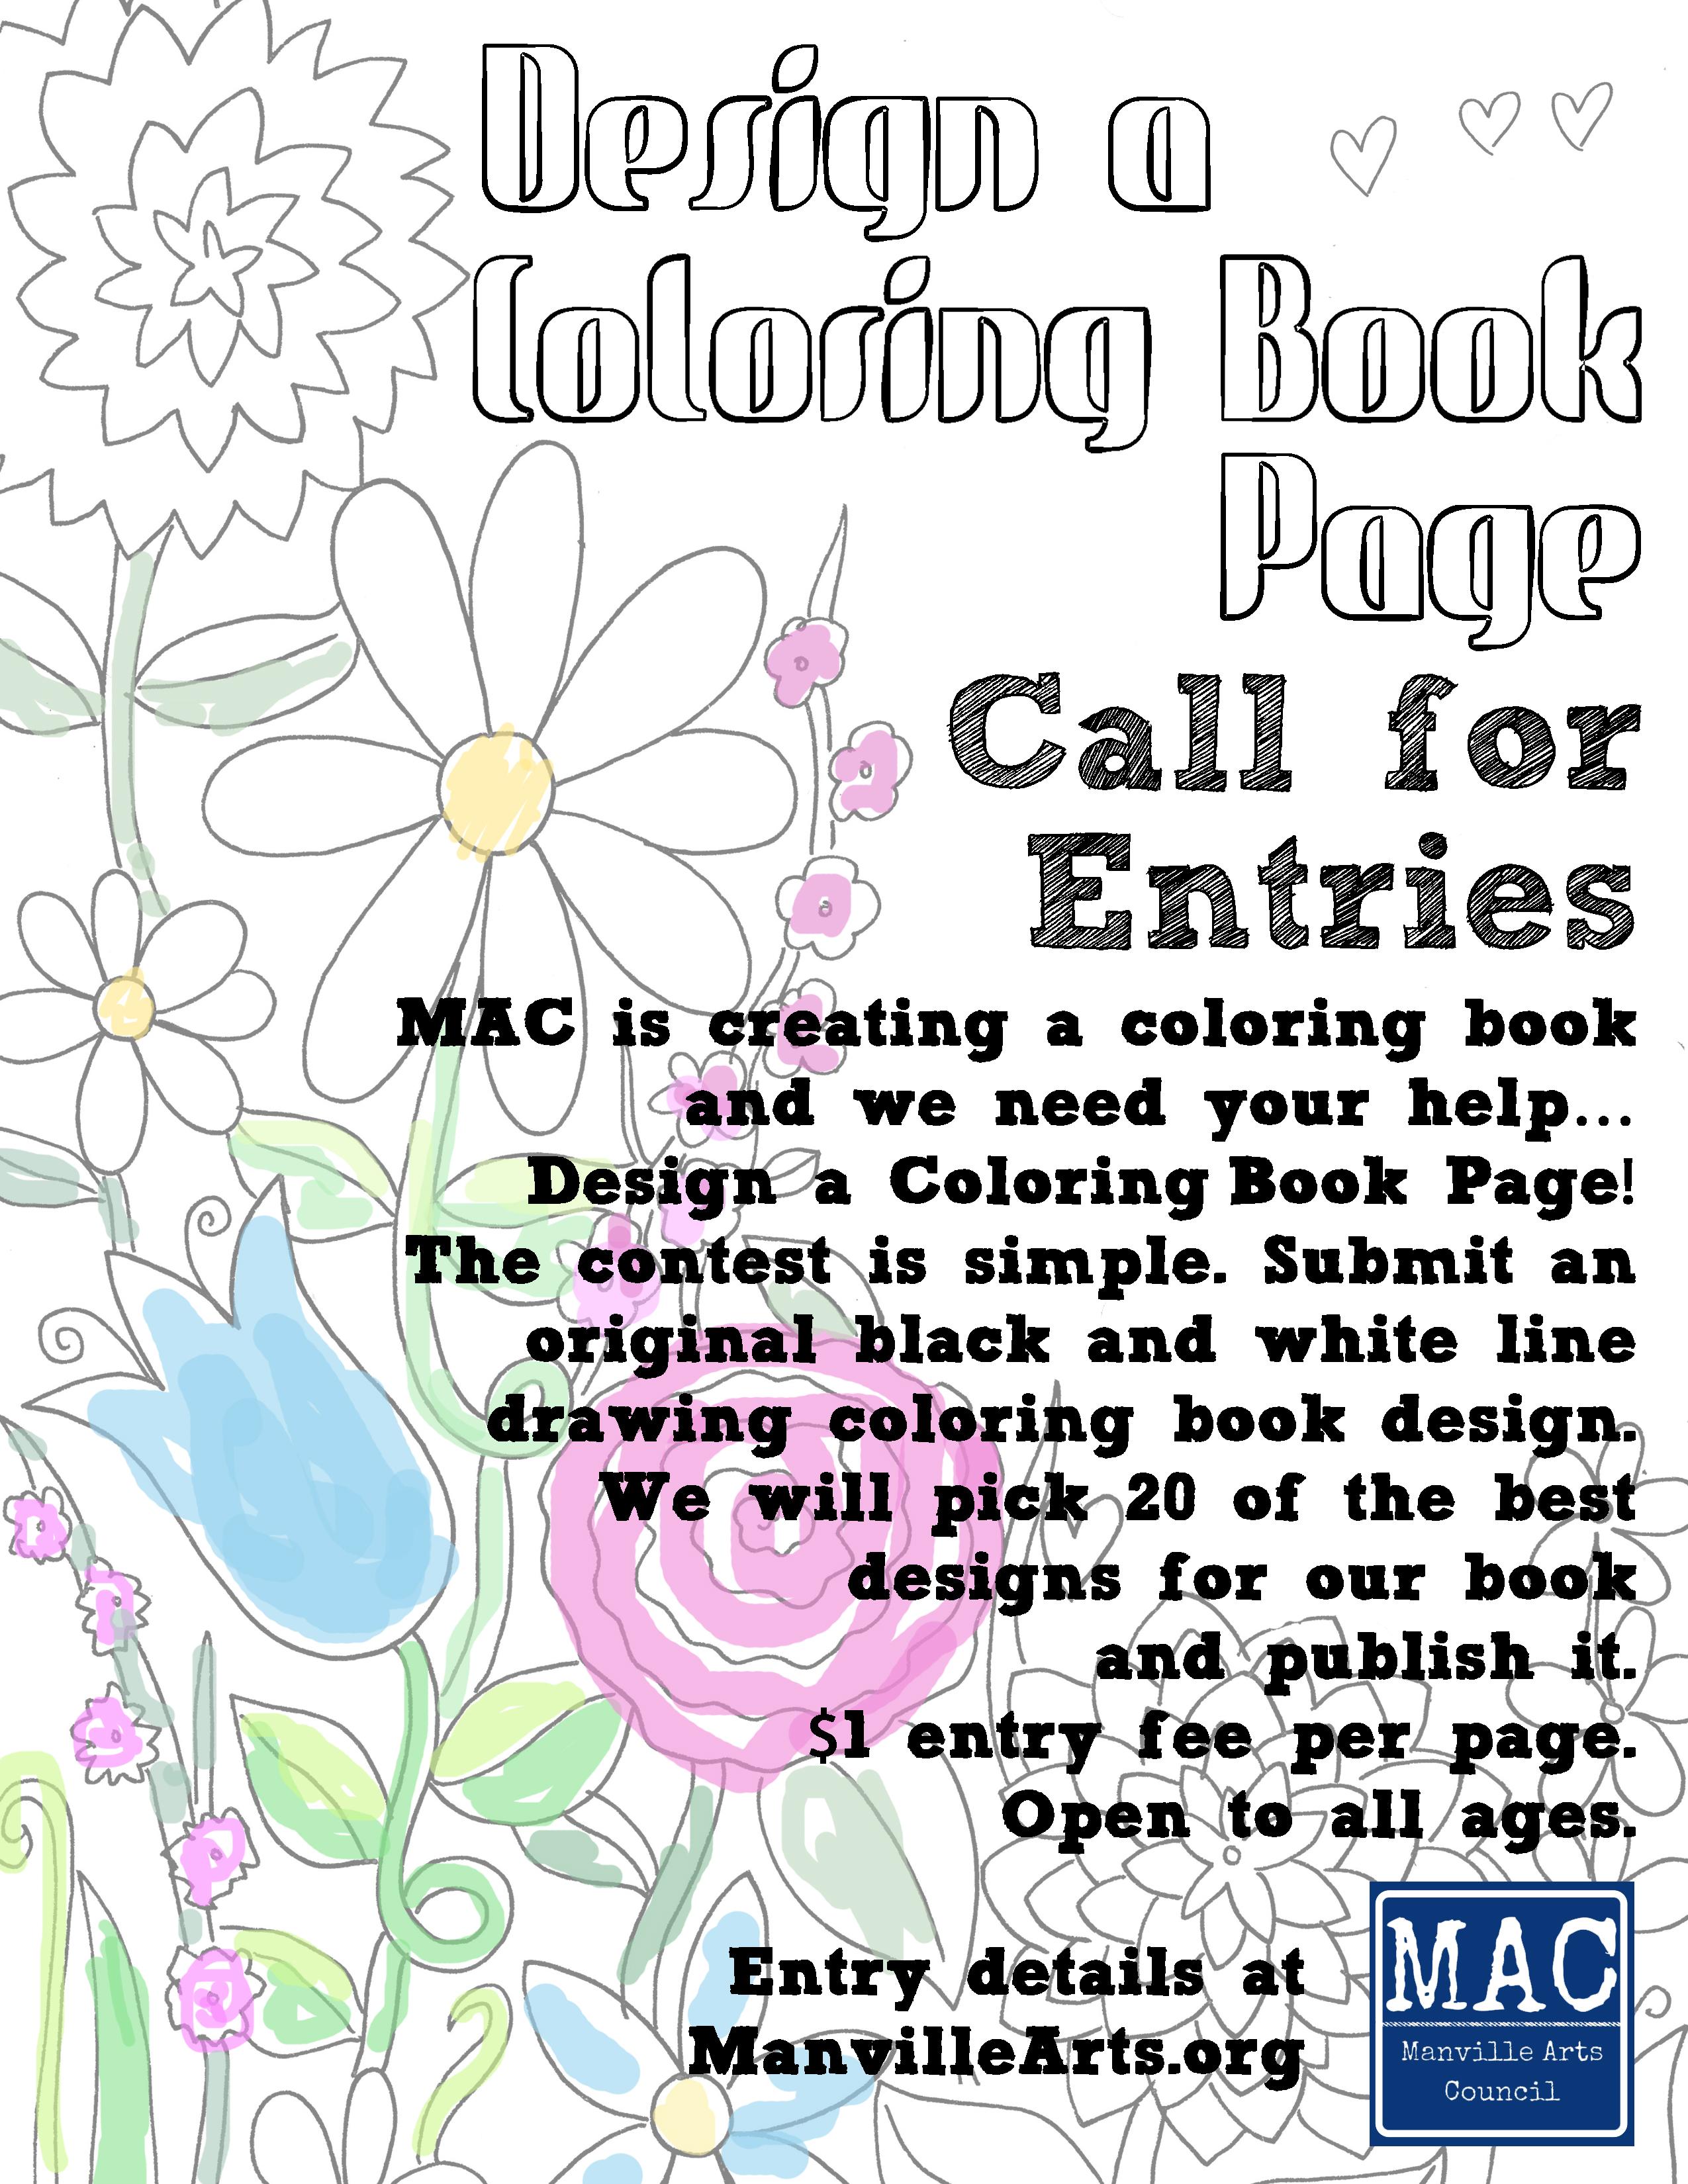 Design a Coloring Book Page — Manville Arts Council